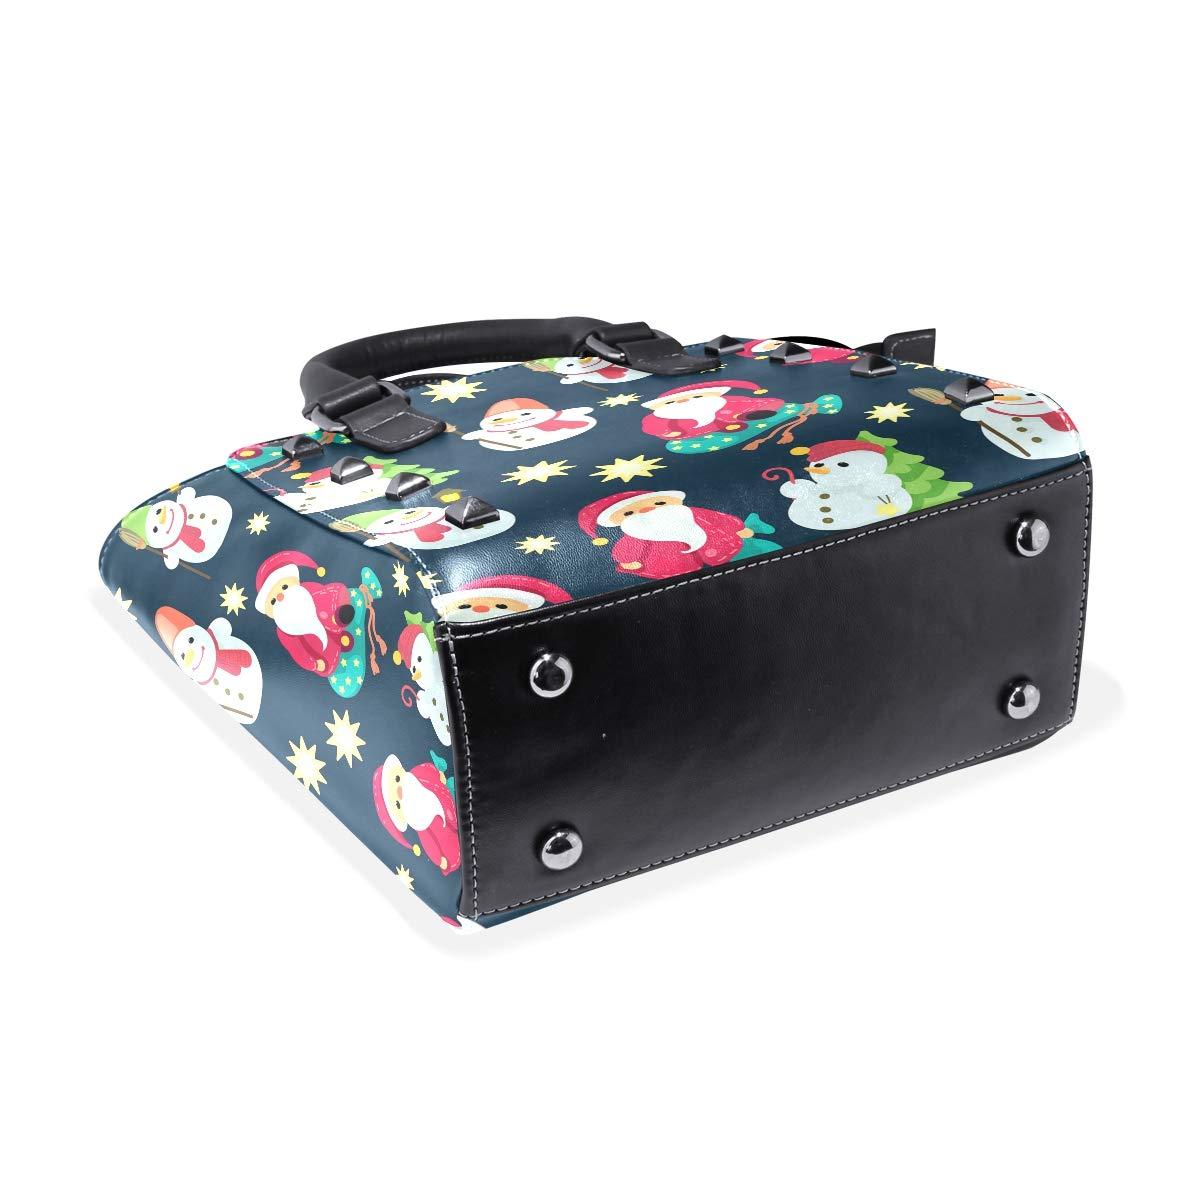 Large Plastic Christmas Bells Womens Classy Satchel Handbag Handbag With shoulder Strap Crossbody Bag